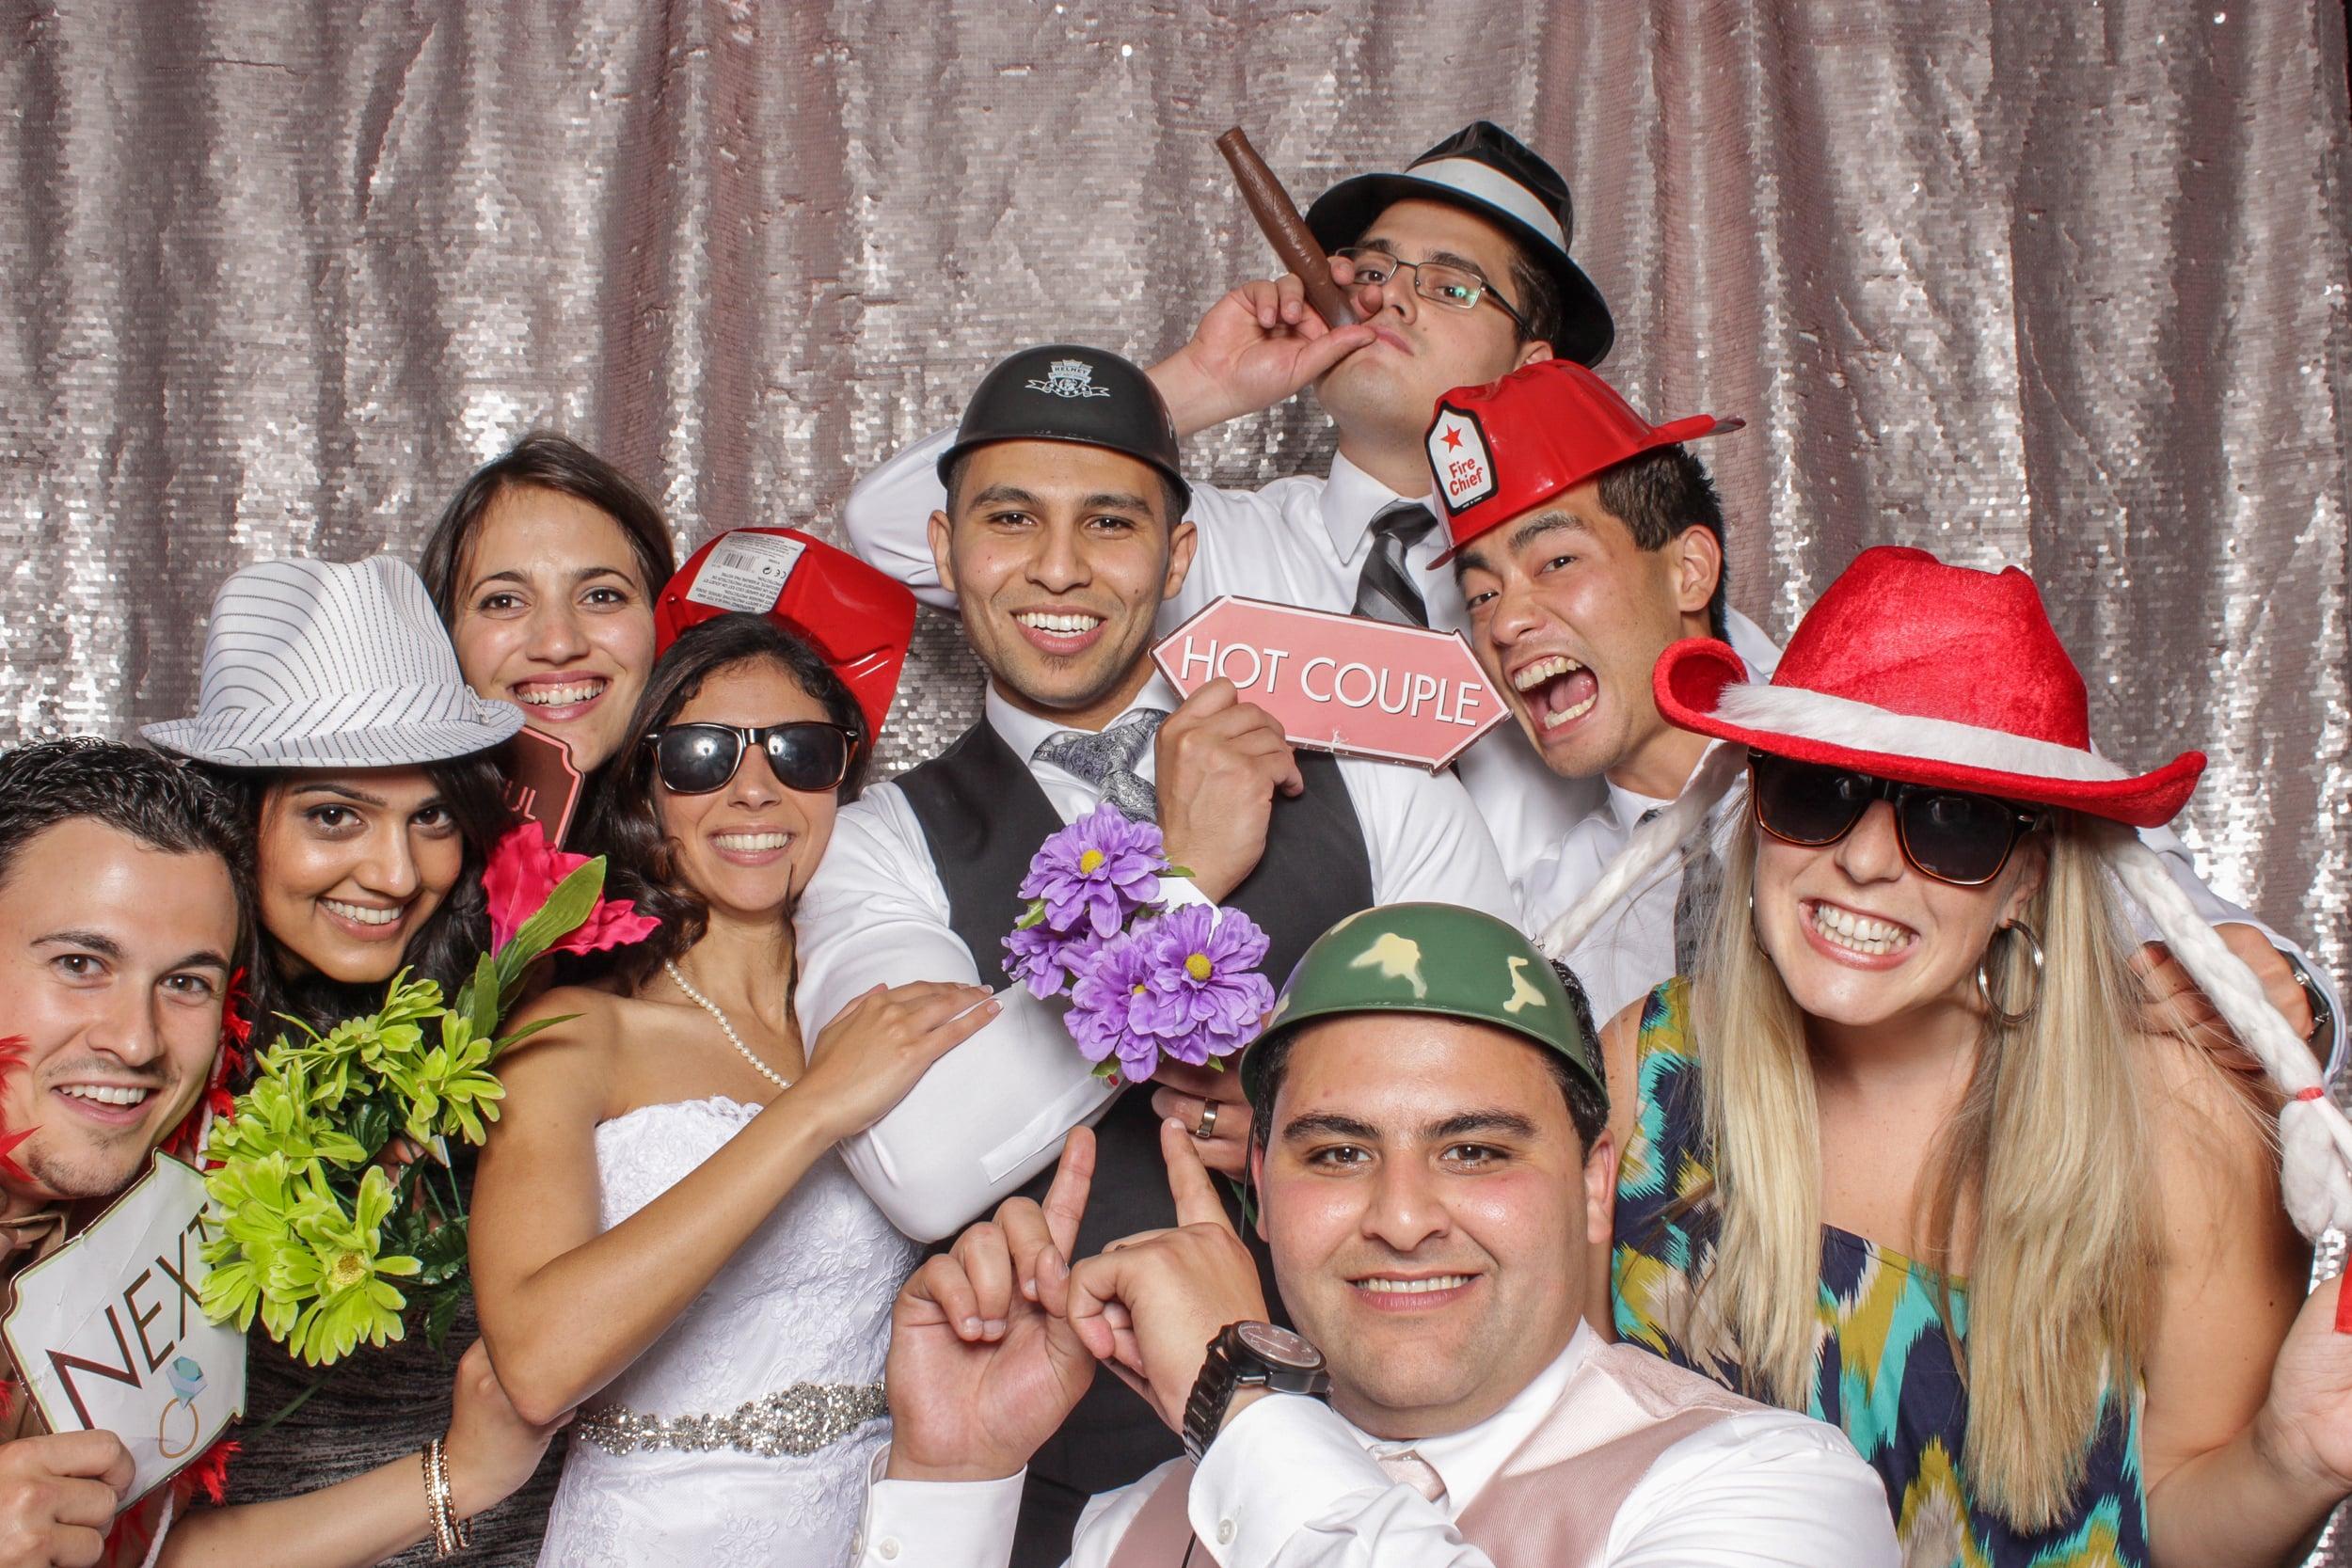 ottawa-wedding-photobooth-45.JPG